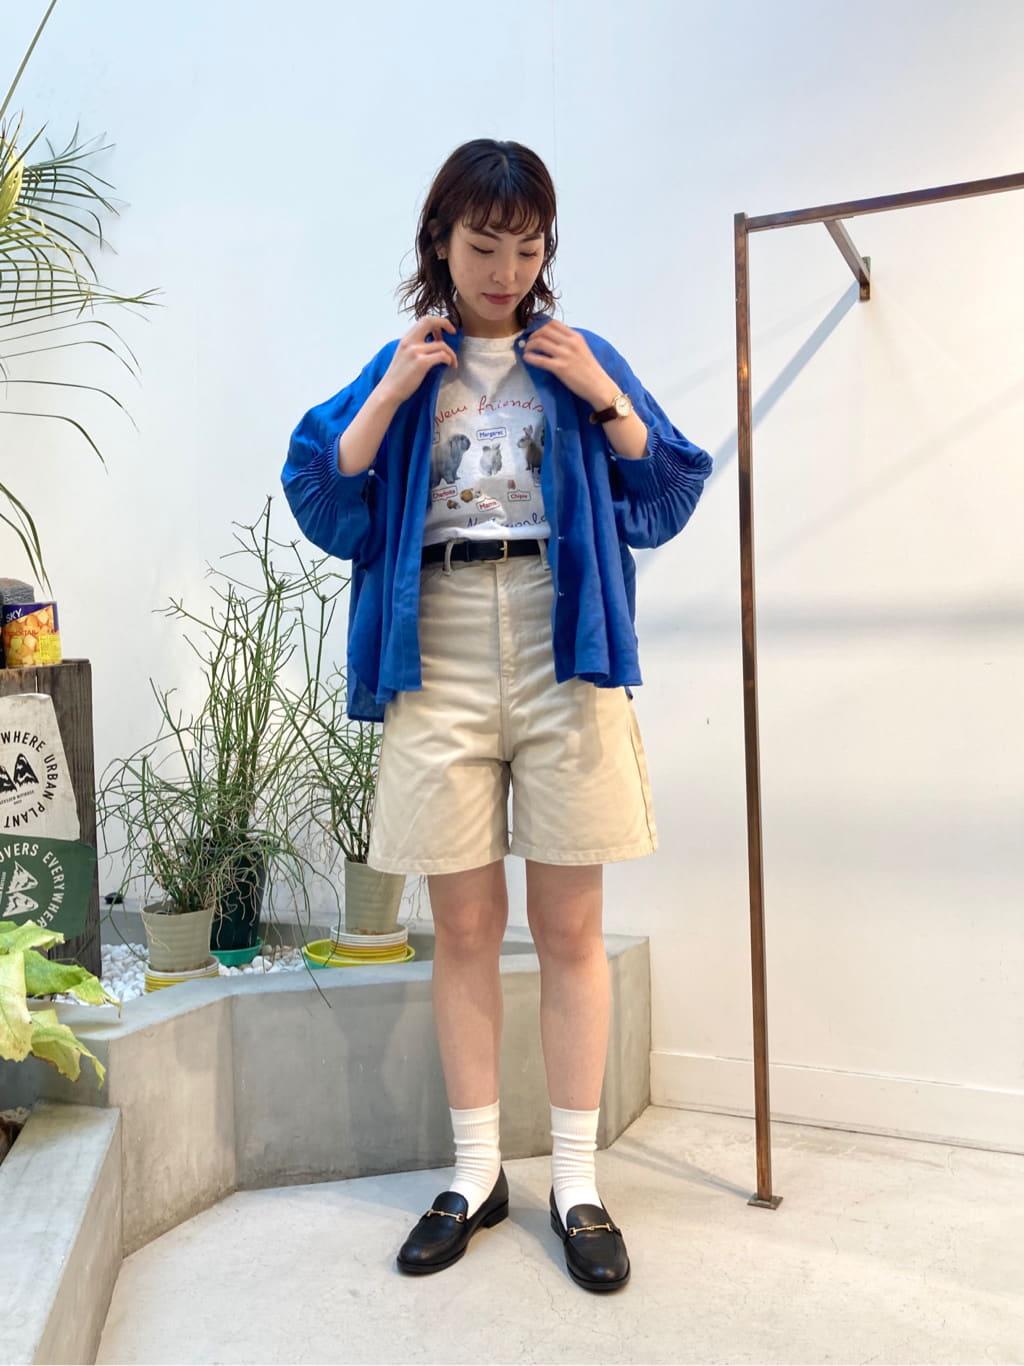 l'atelier du savon 名古屋栄路面 身長:161cm 2021.07.16